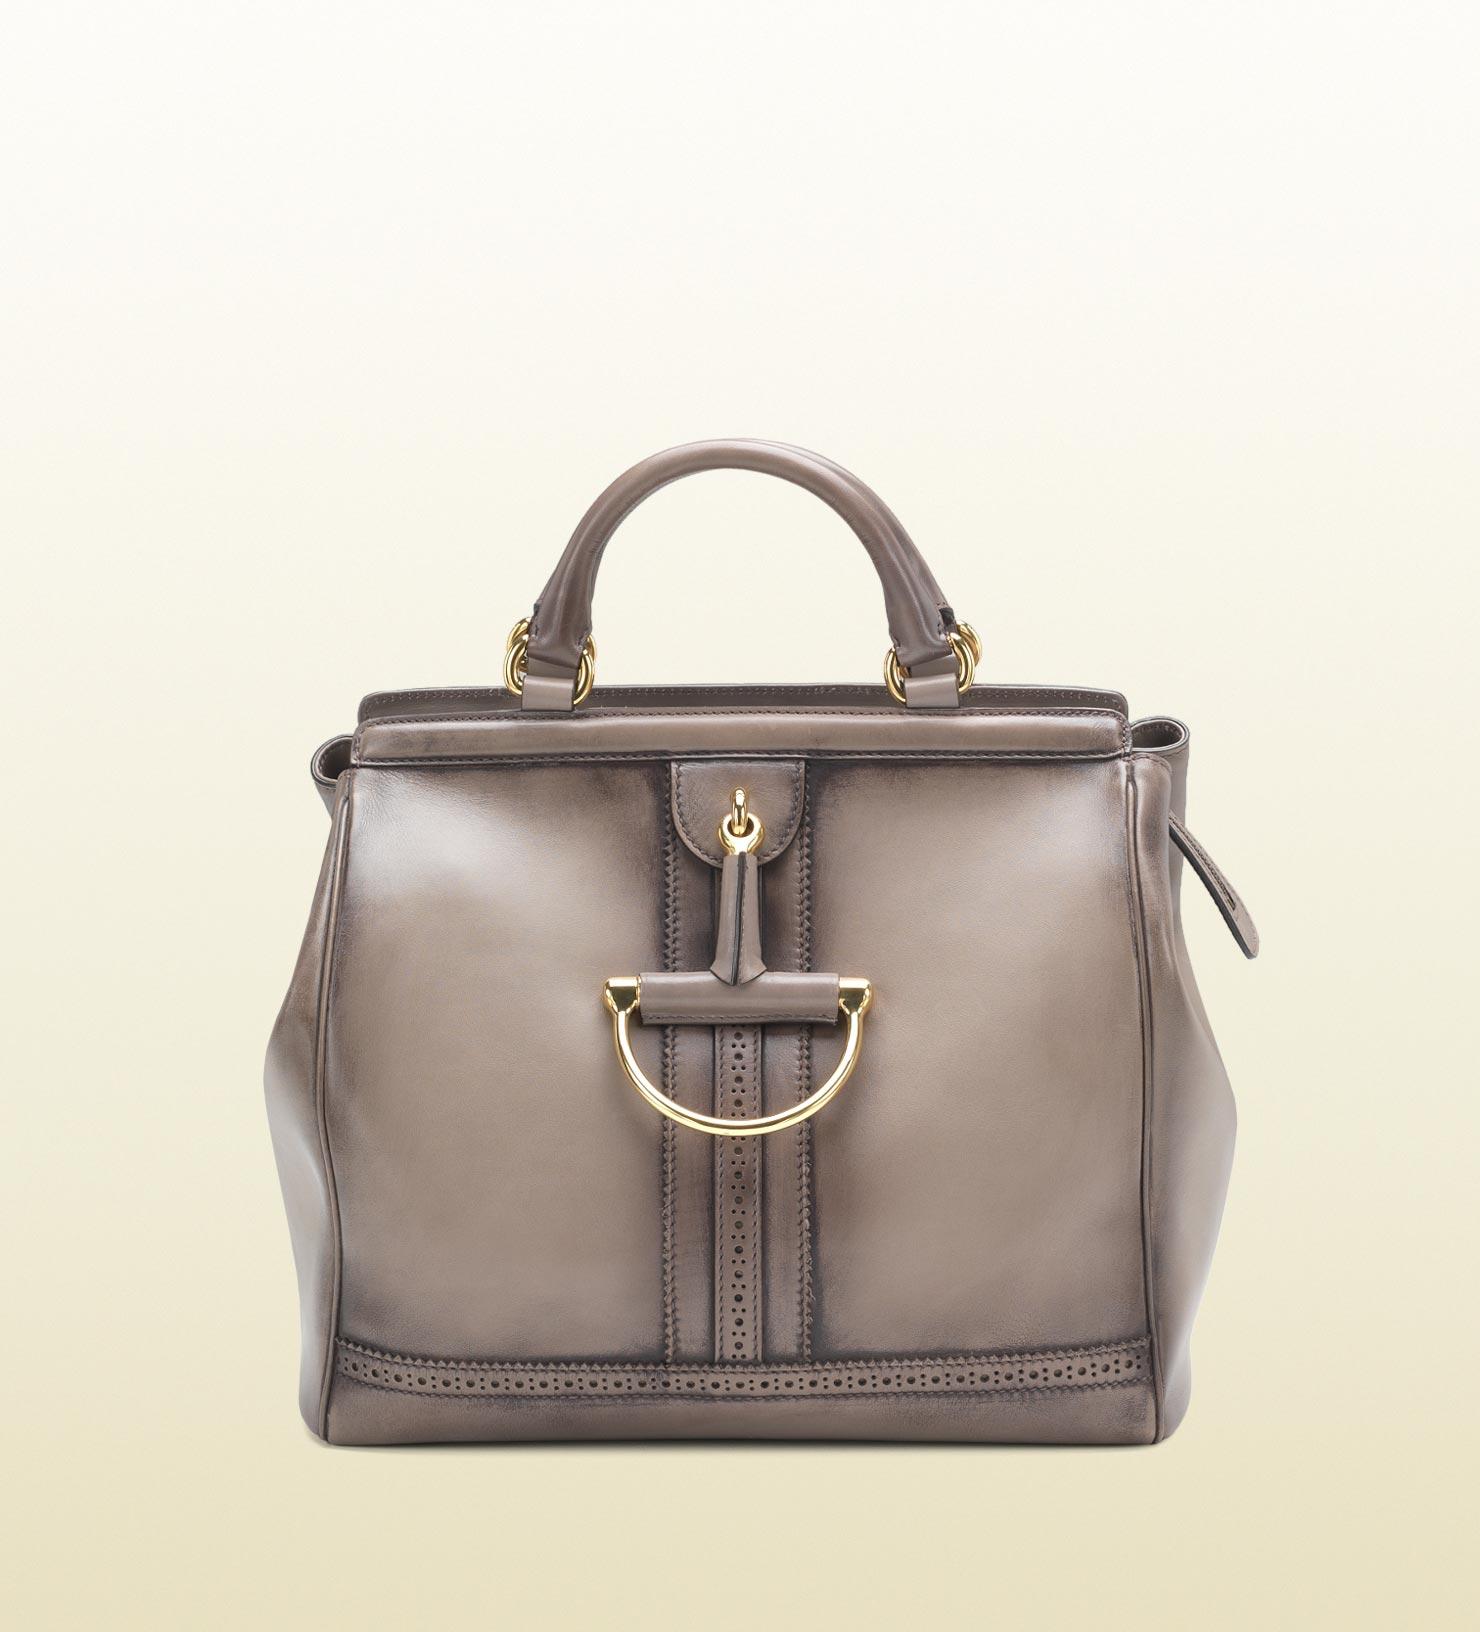 a53879da7e38 Gucci Duilio Brogue Leather Top Handle Bag in Brown - Lyst